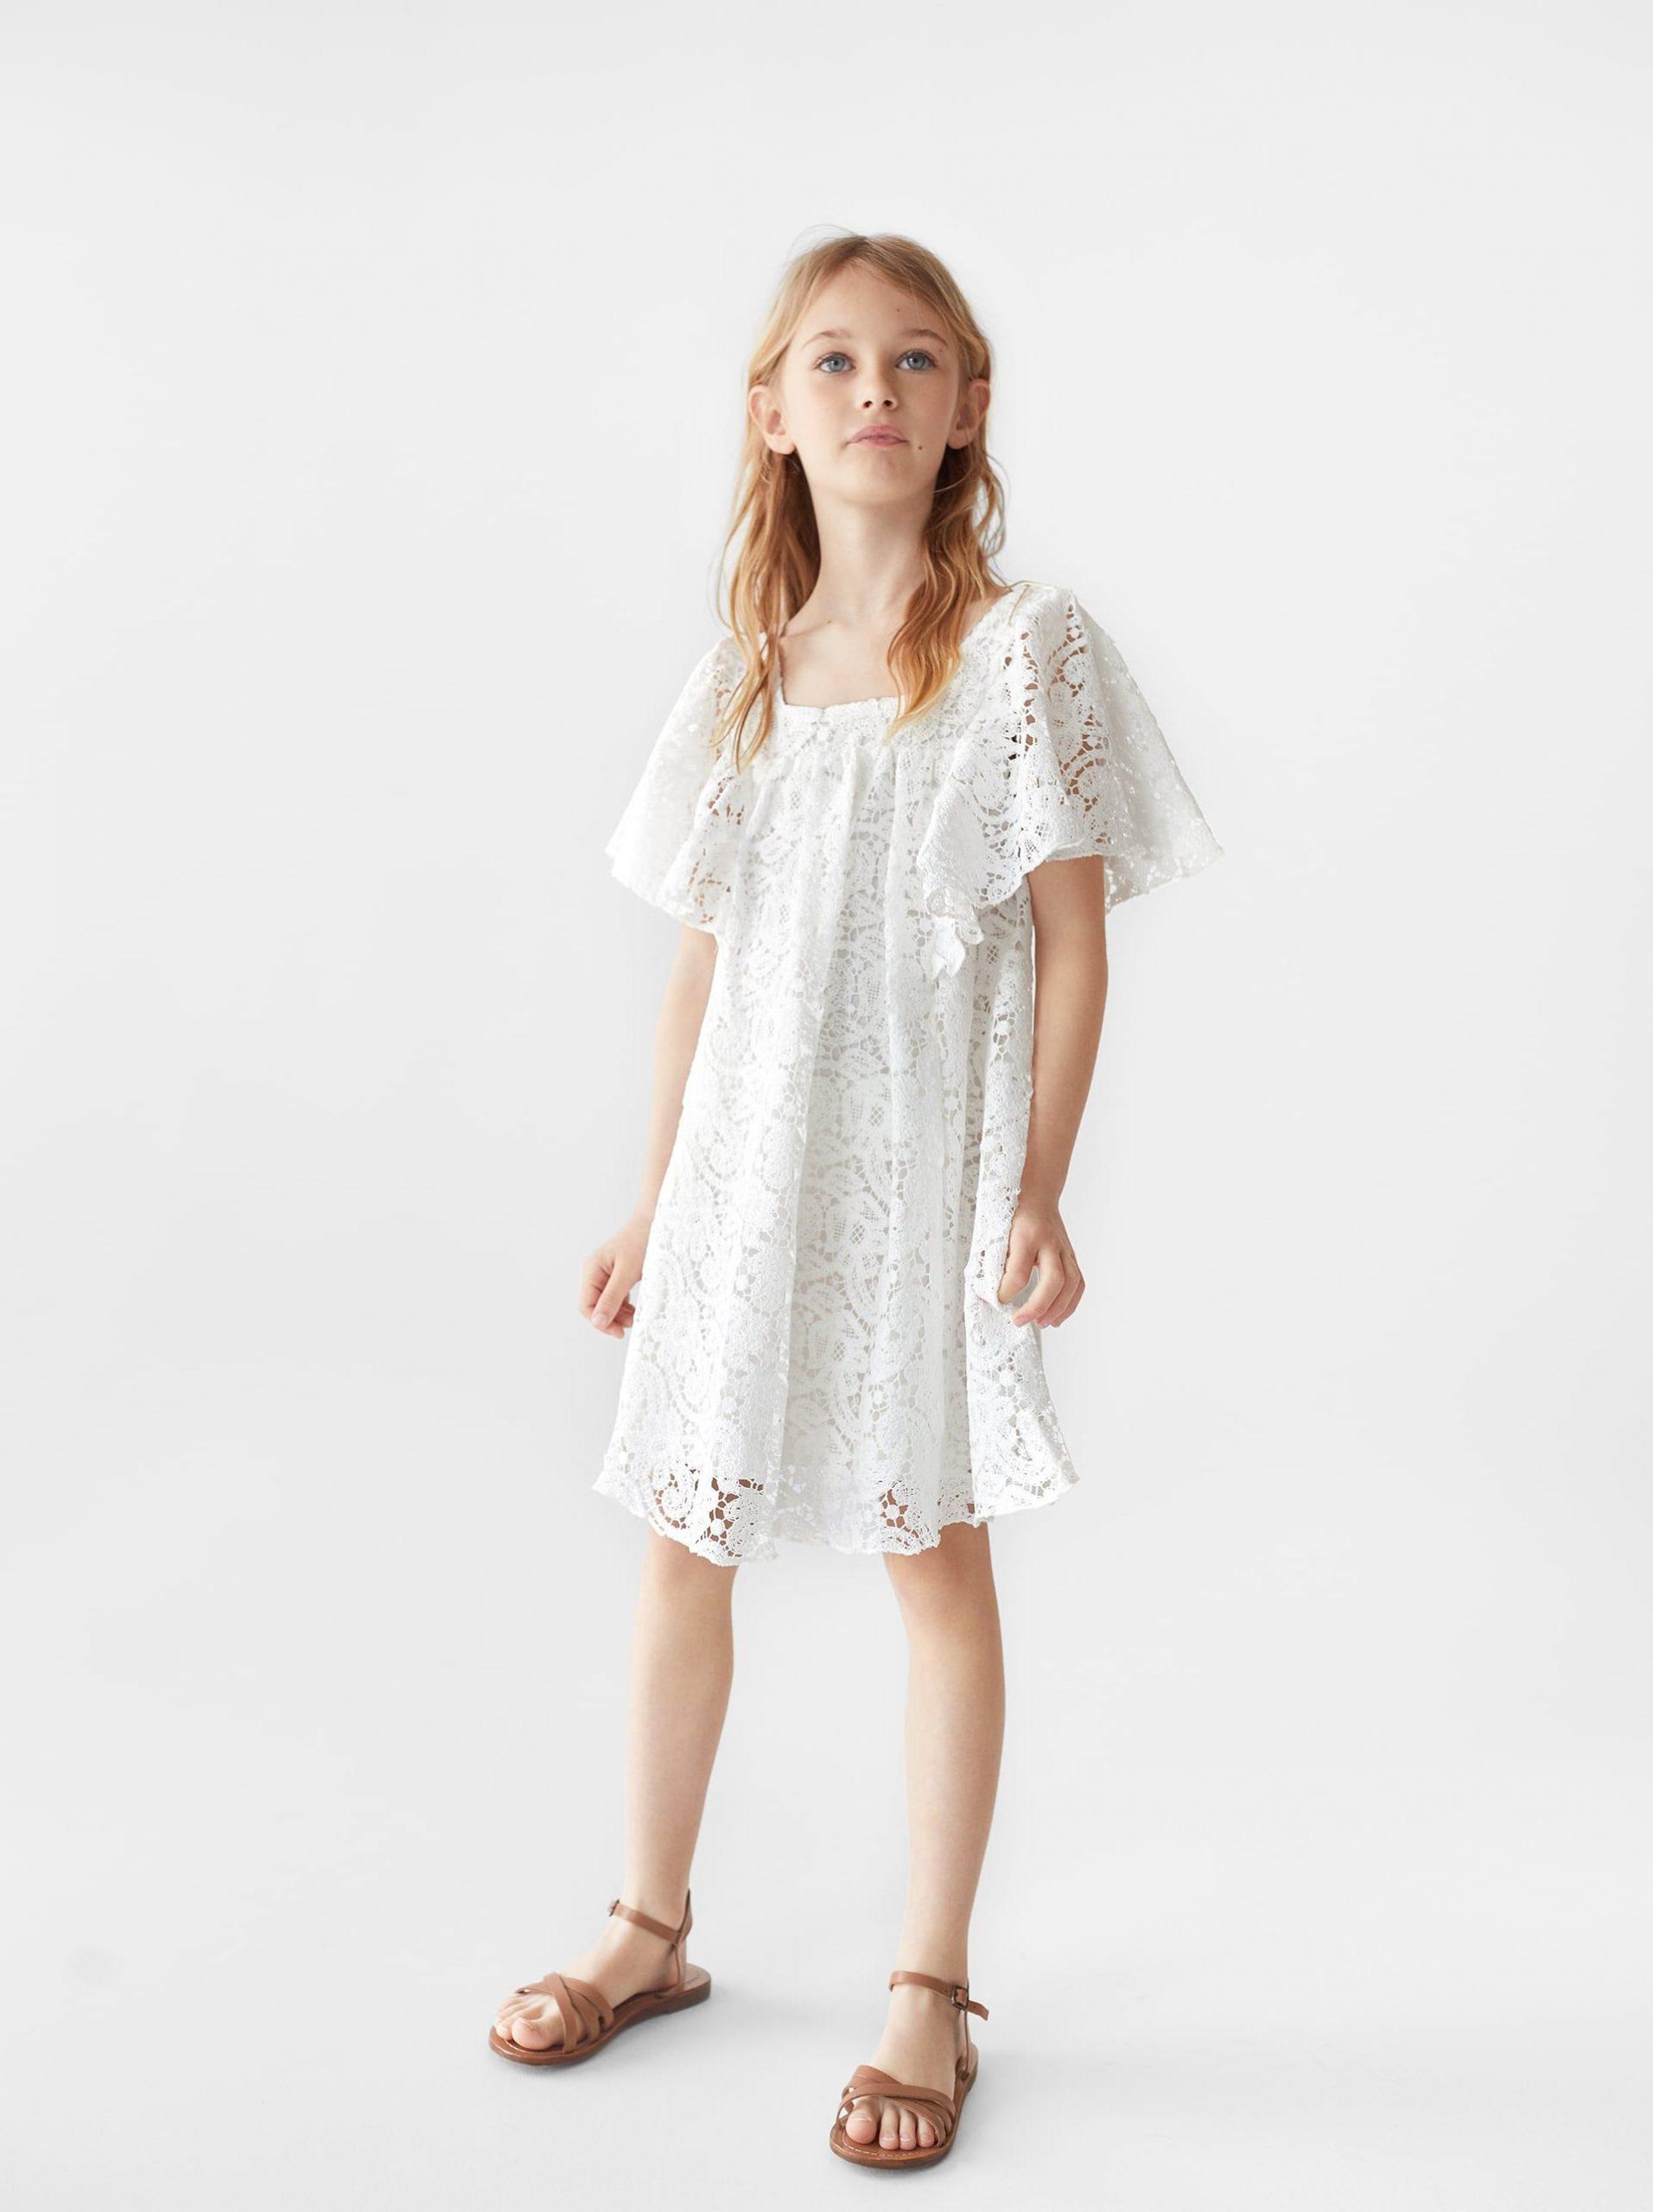 Zara  Kids  Lace Dress  Weißes Spitzenkleid Kleid